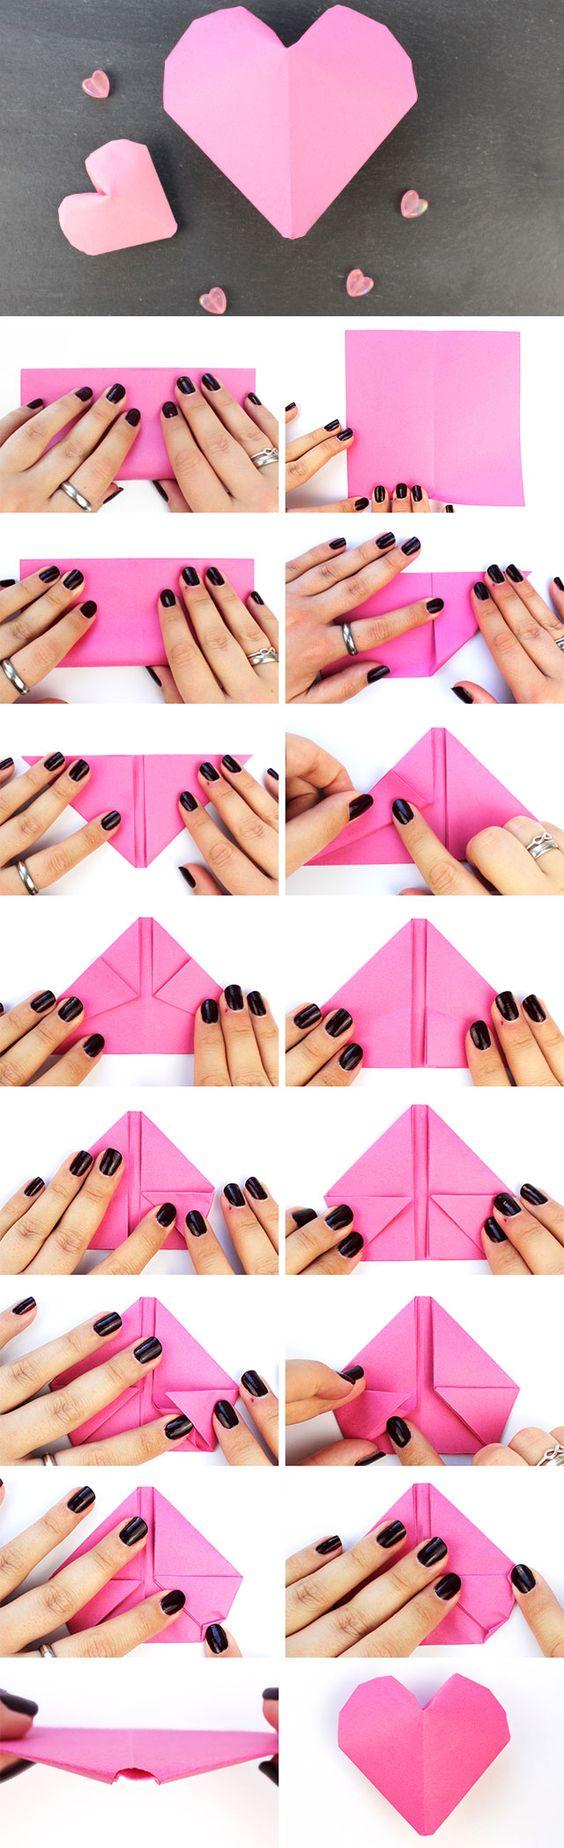 3d origami herz faltanleitung origami falten anleitung papier basteln origami. Black Bedroom Furniture Sets. Home Design Ideas